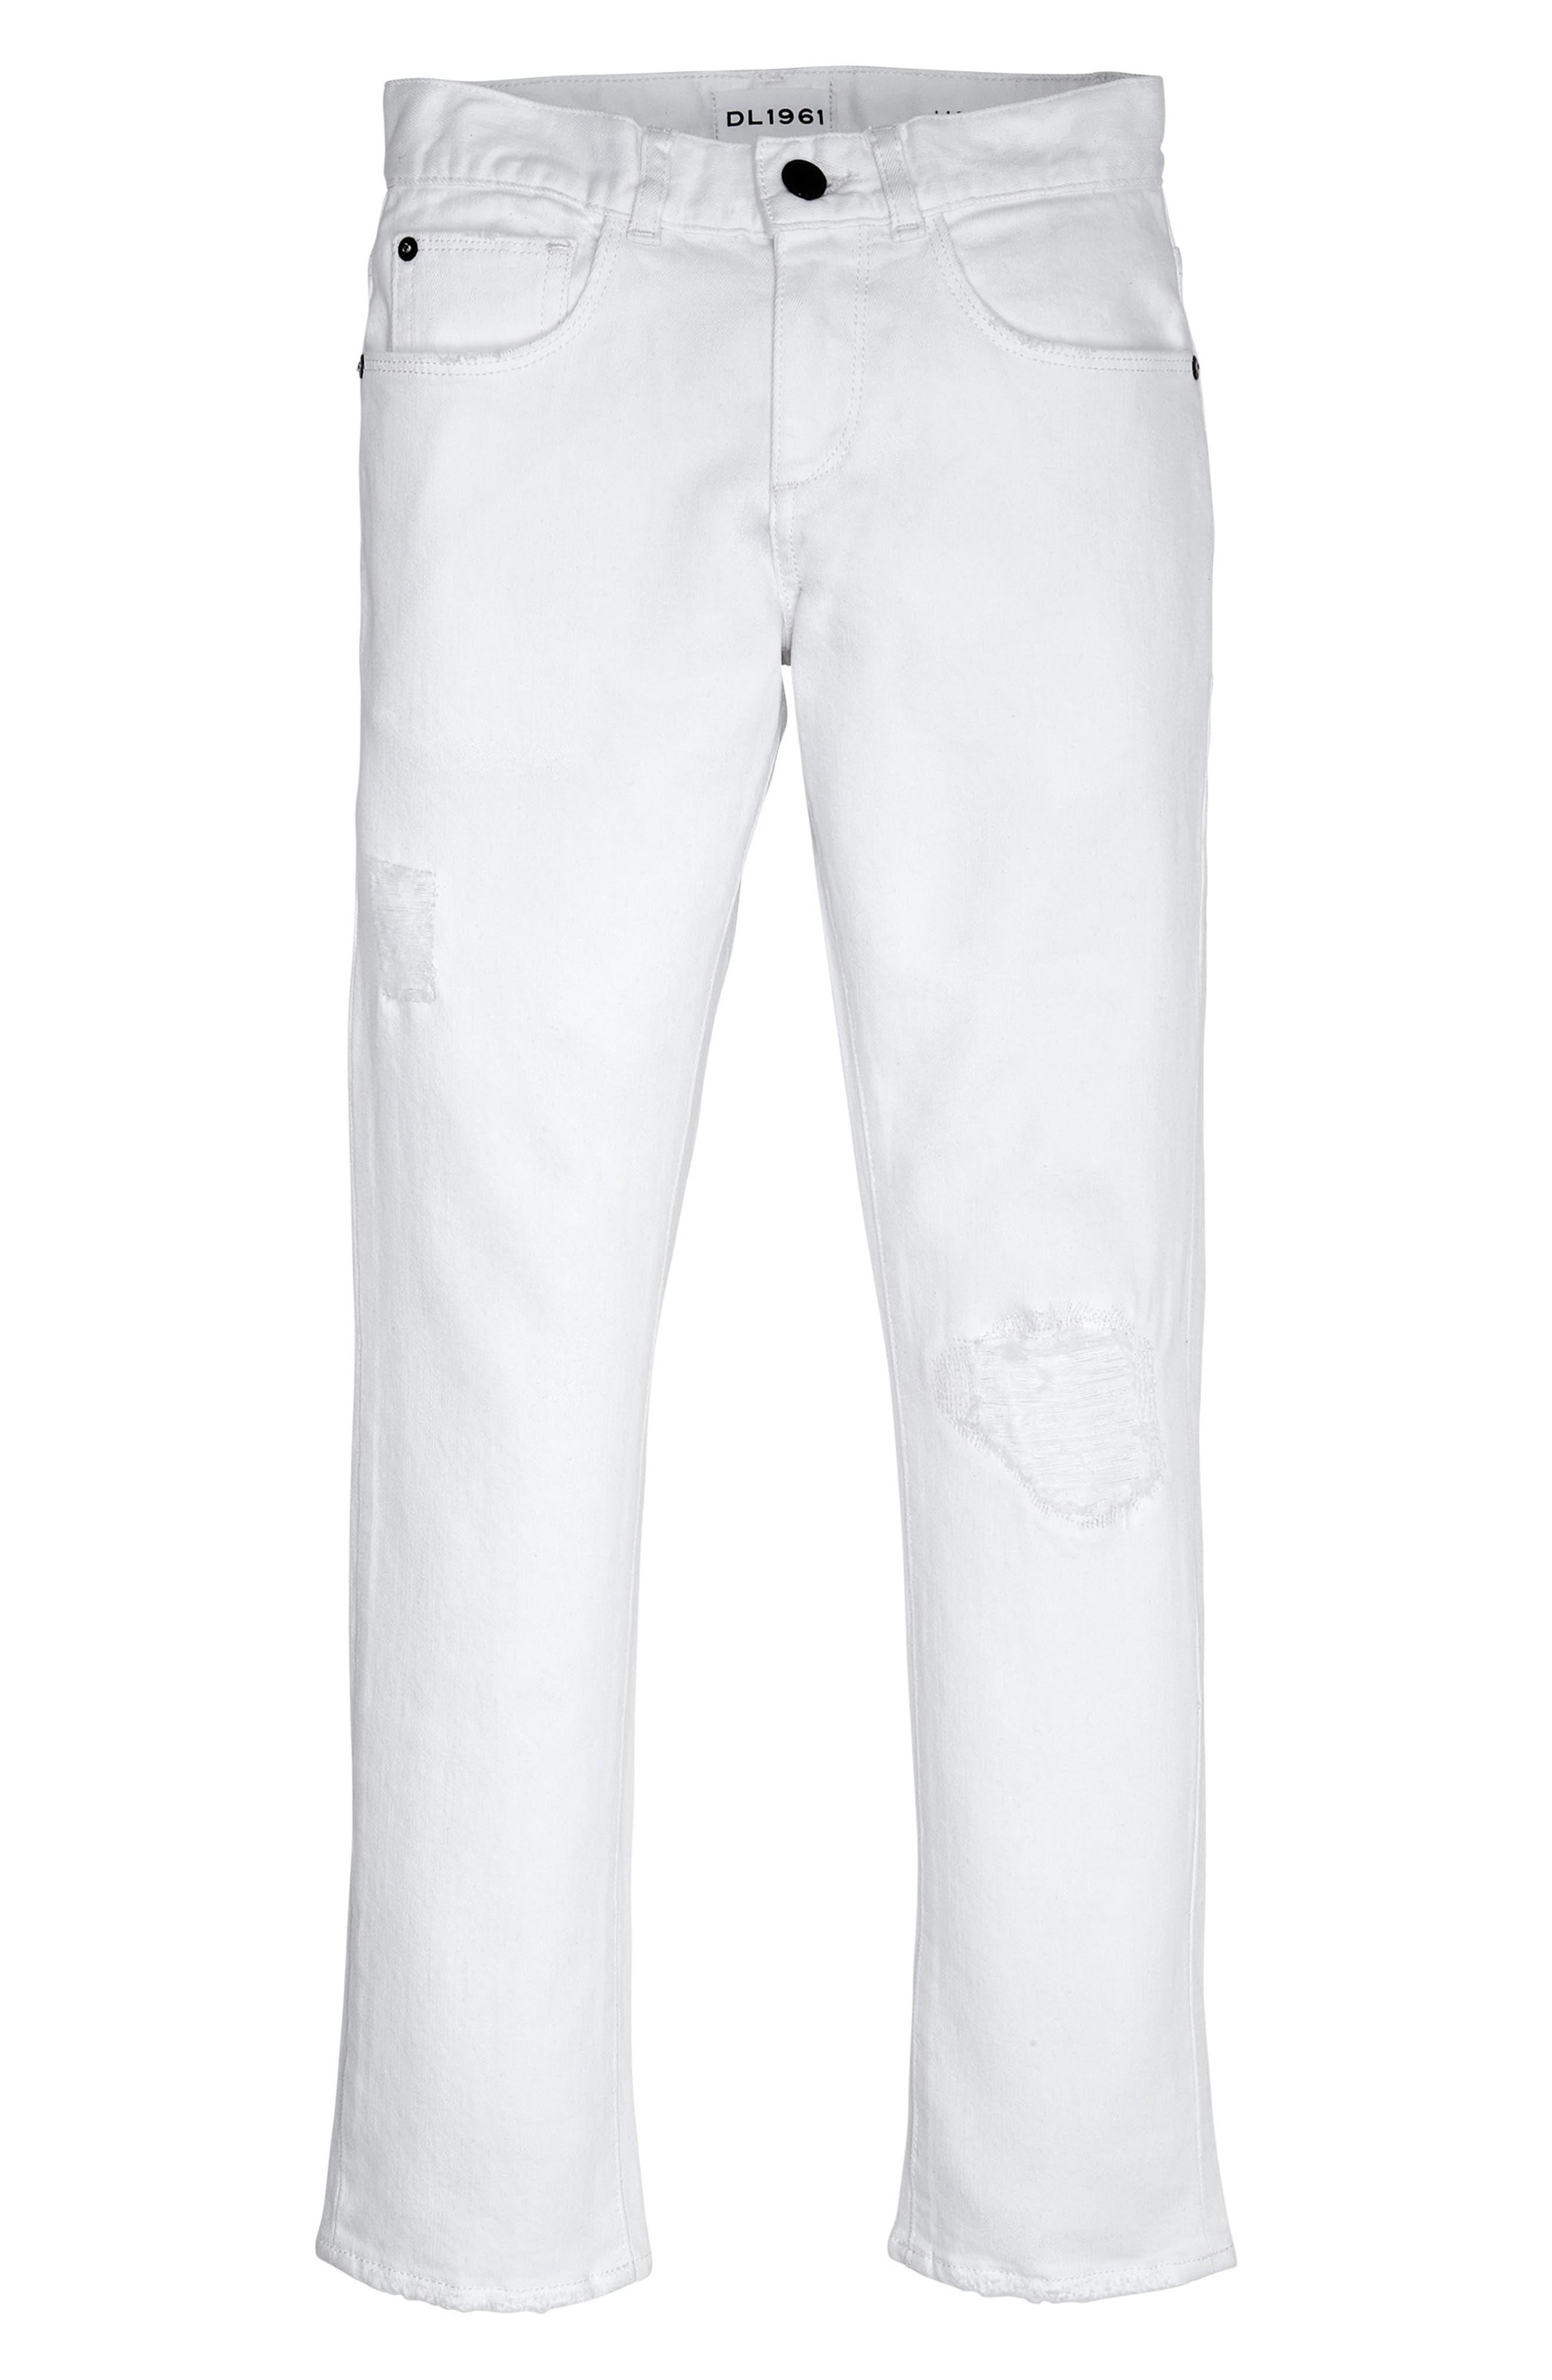 Brady Distressed Slim Fit Jeans,                         Main,                         color, Bulletproof